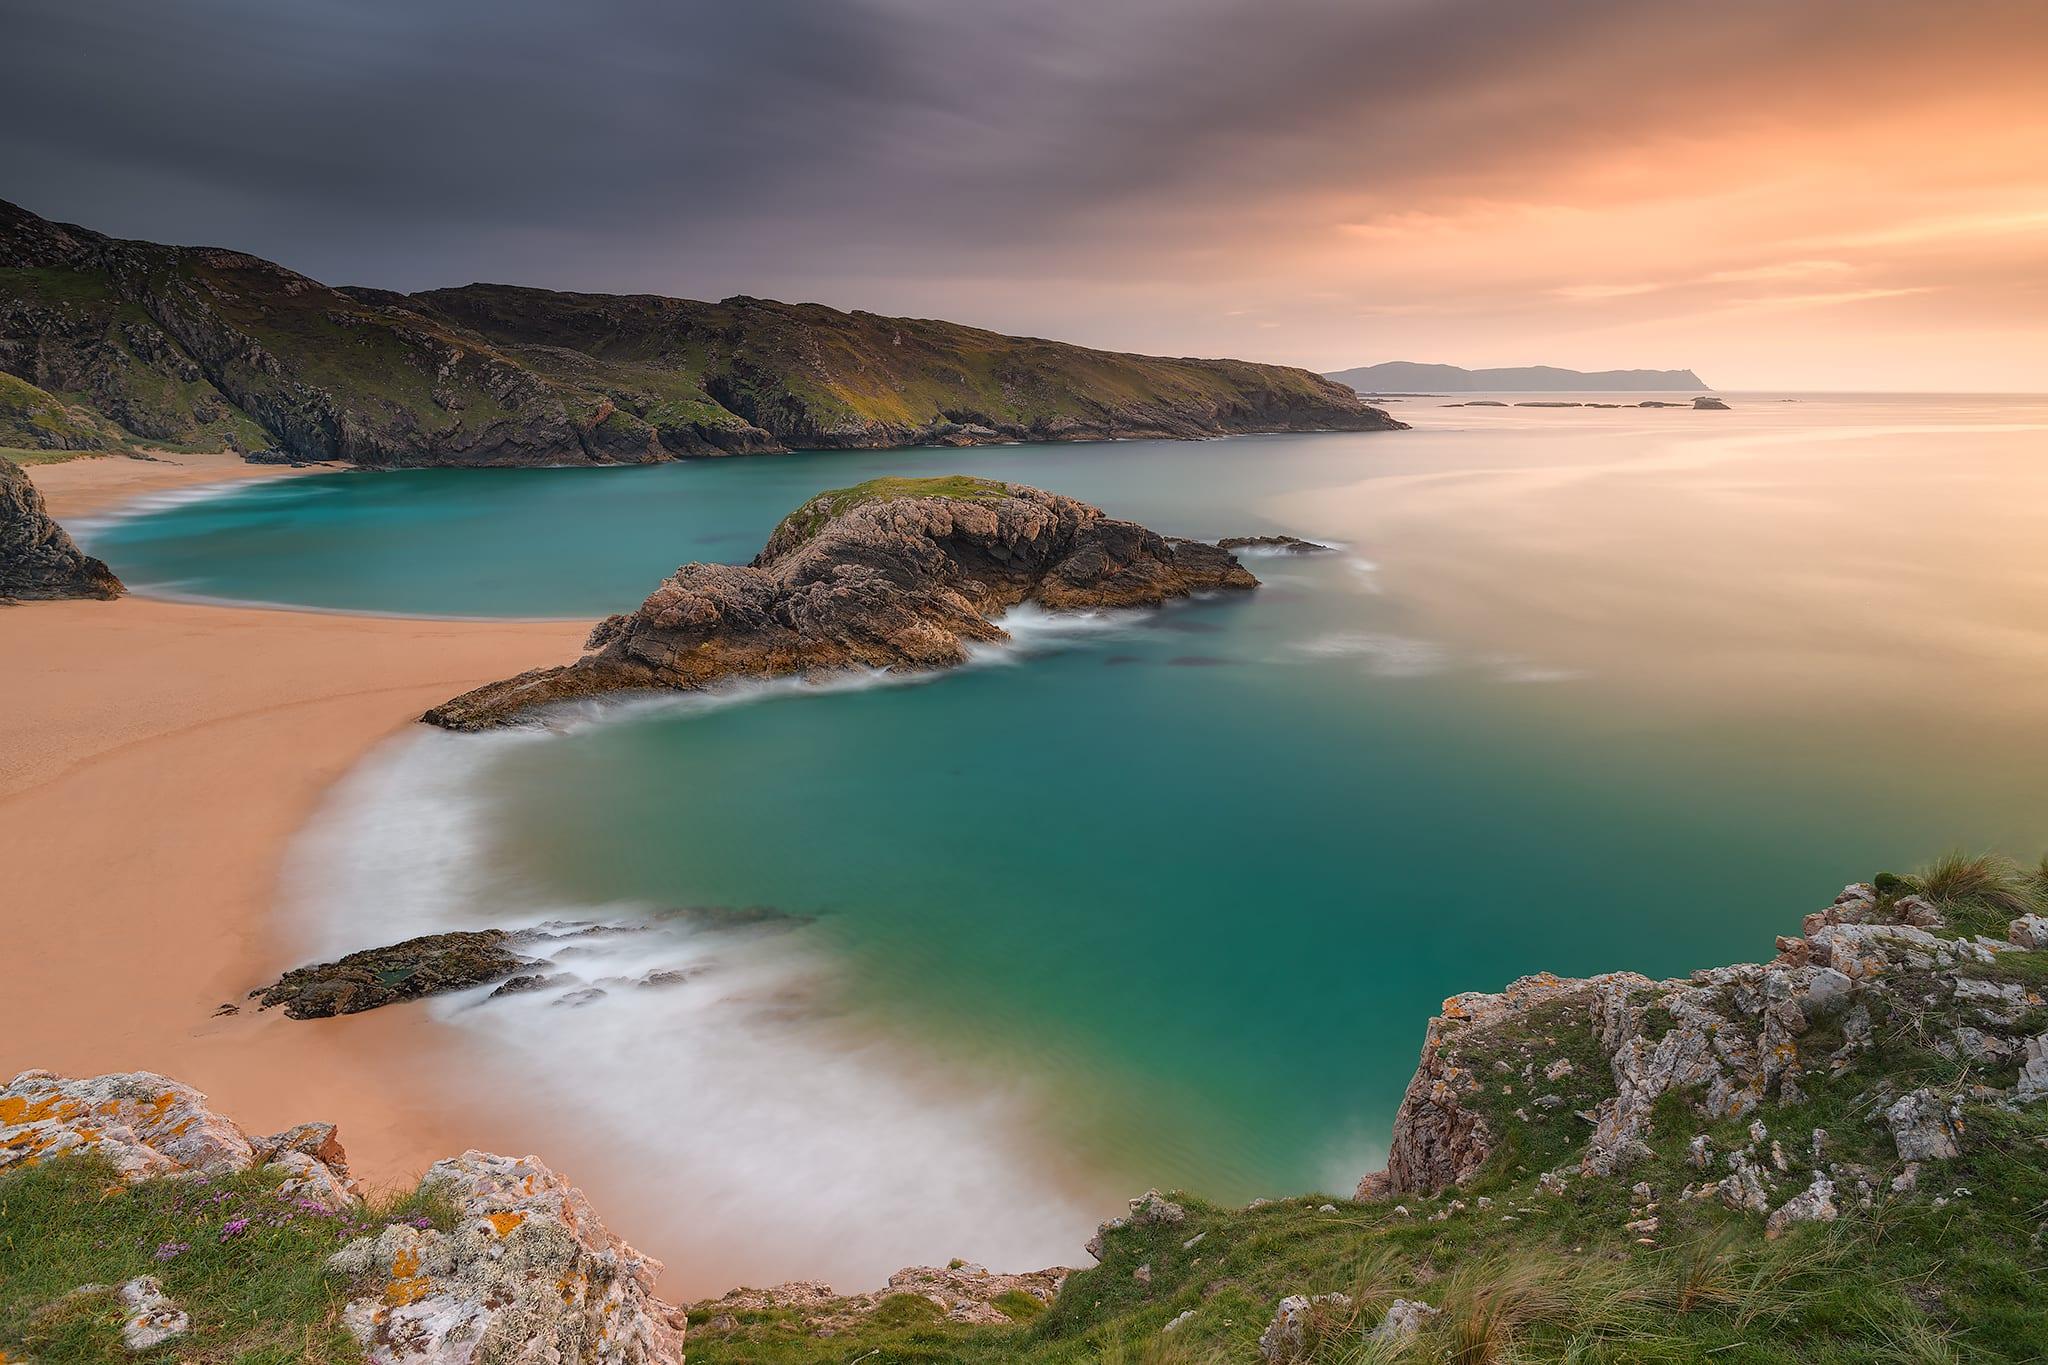 Francesco Gola Ireland Seascape Landscape Europe Murder Hole Beach Donegal Sunset Summer Warm Fine Art Print